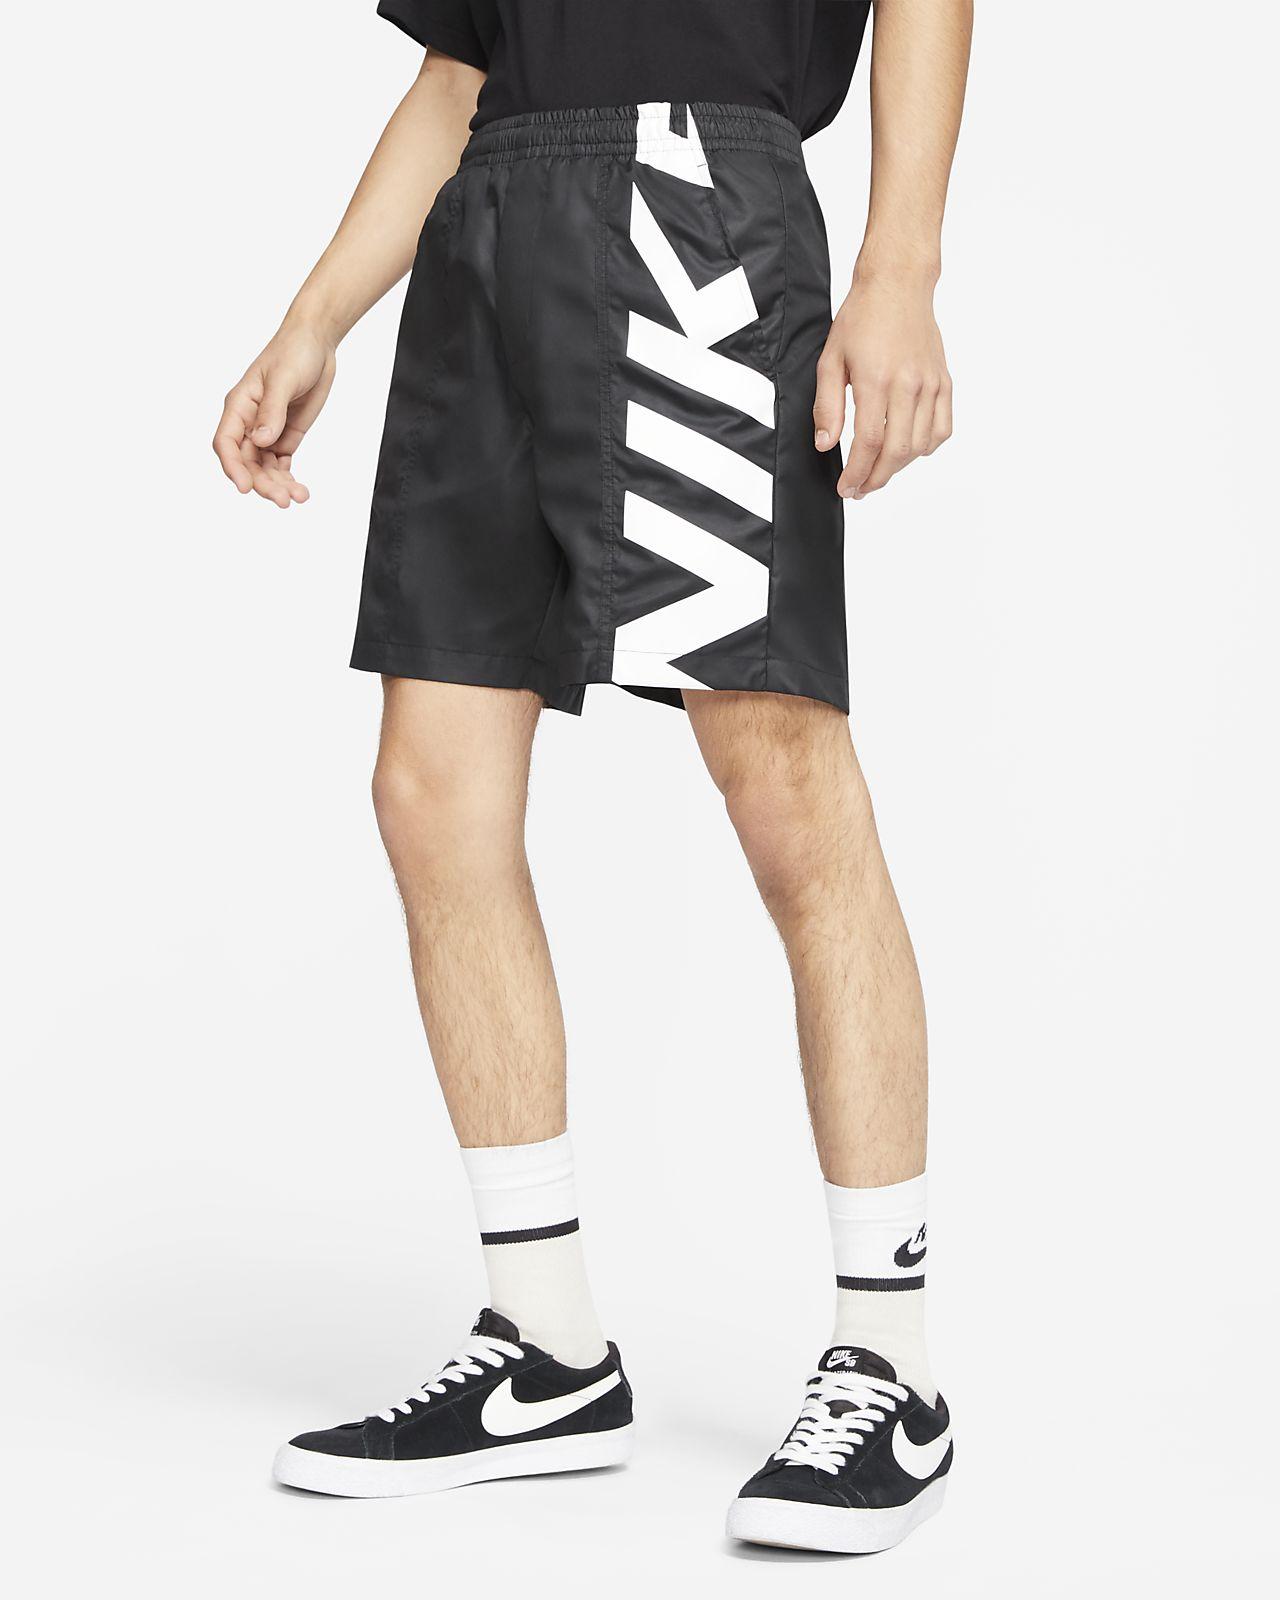 Short de skateboard Nike SB pour Homme